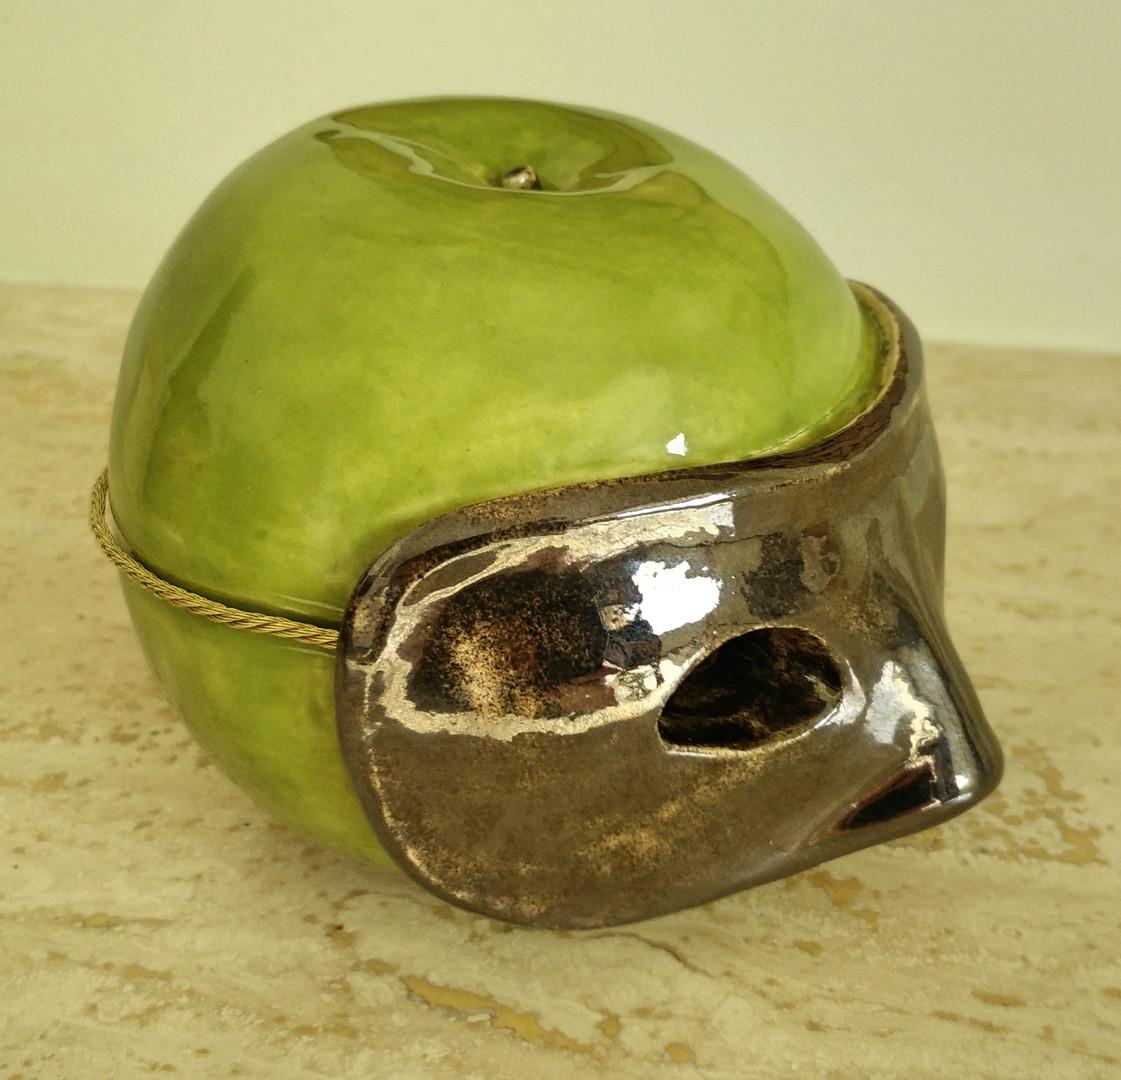 Apple for Magritte